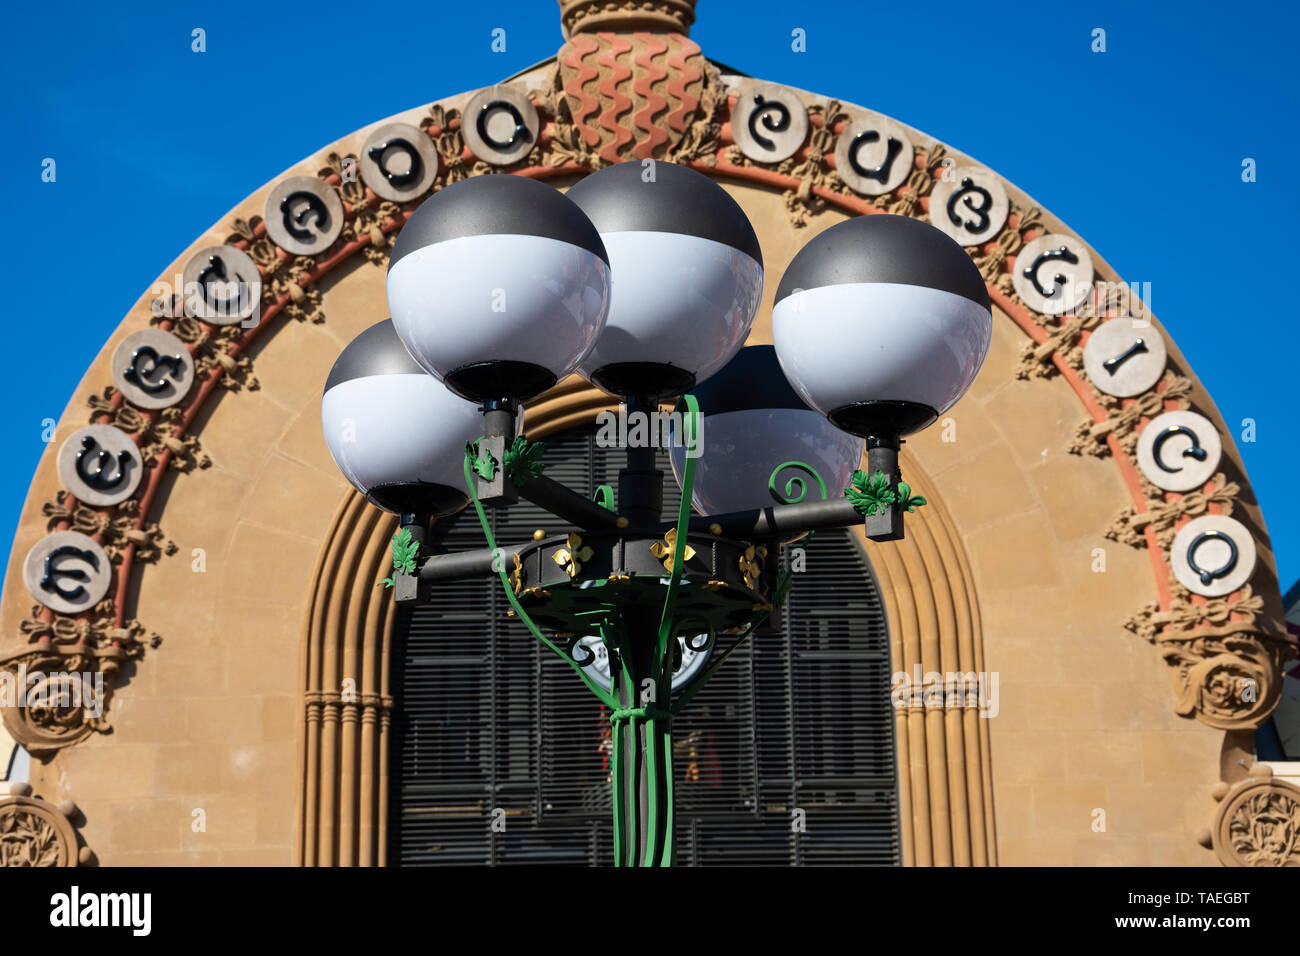 Tarragona, Spain. February 8, 2019. Public Market of Tarragona (Mercado Publico) - Stock Image